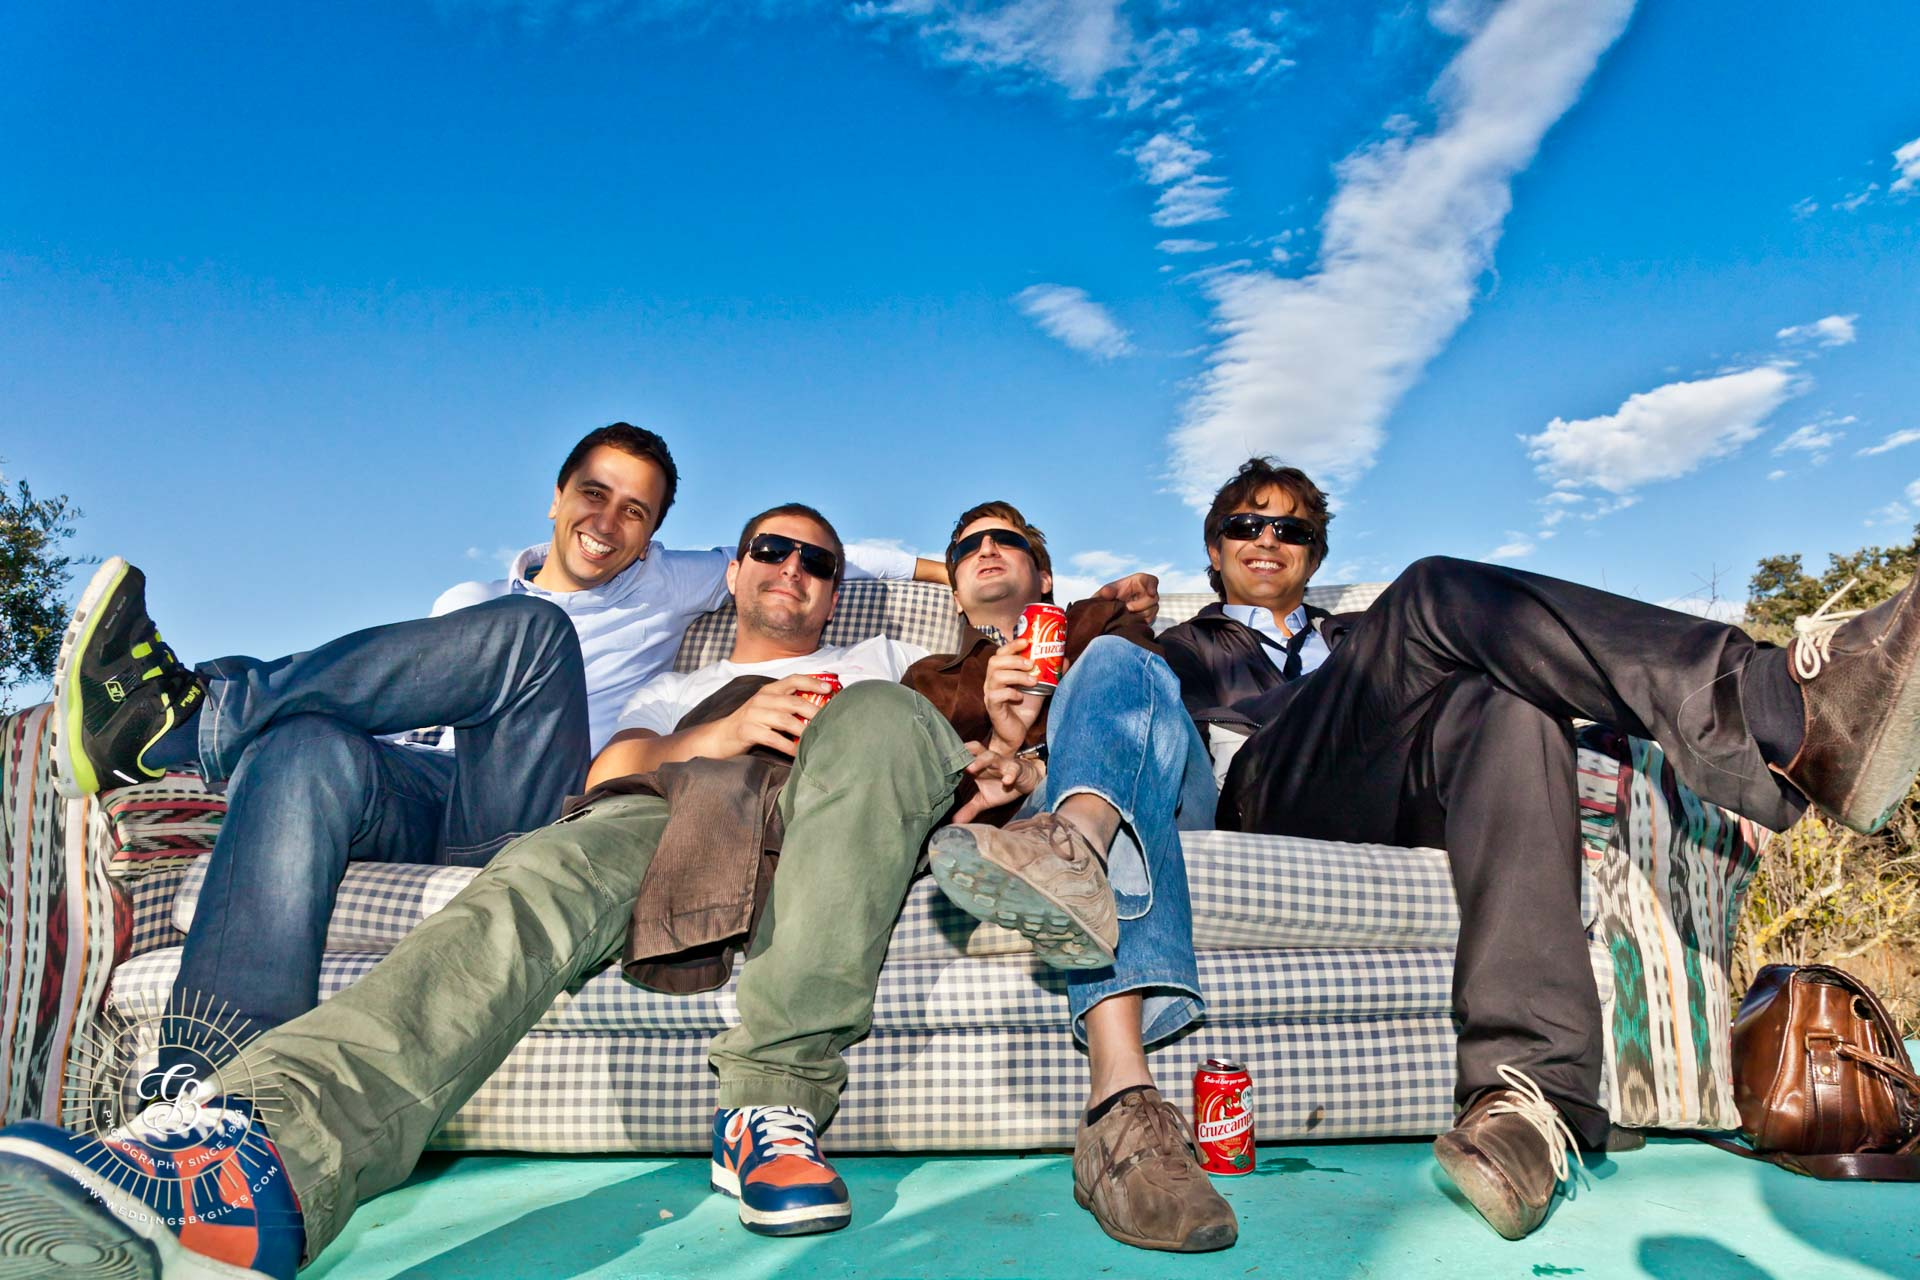 the guys on the sofa